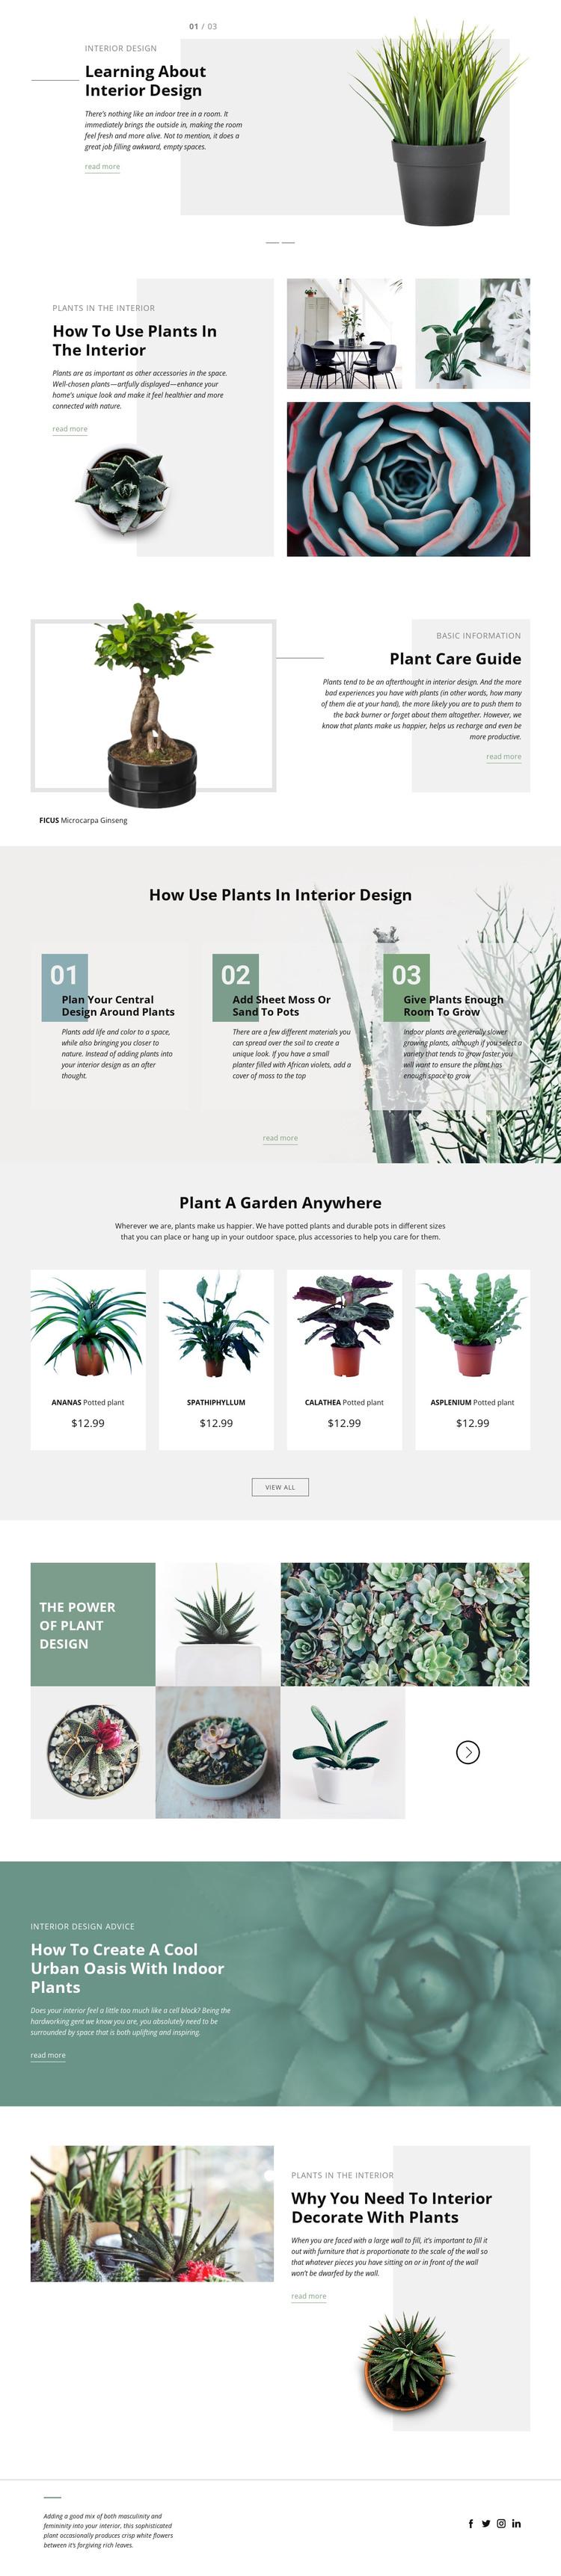 Interior Design Studio WordPress Theme